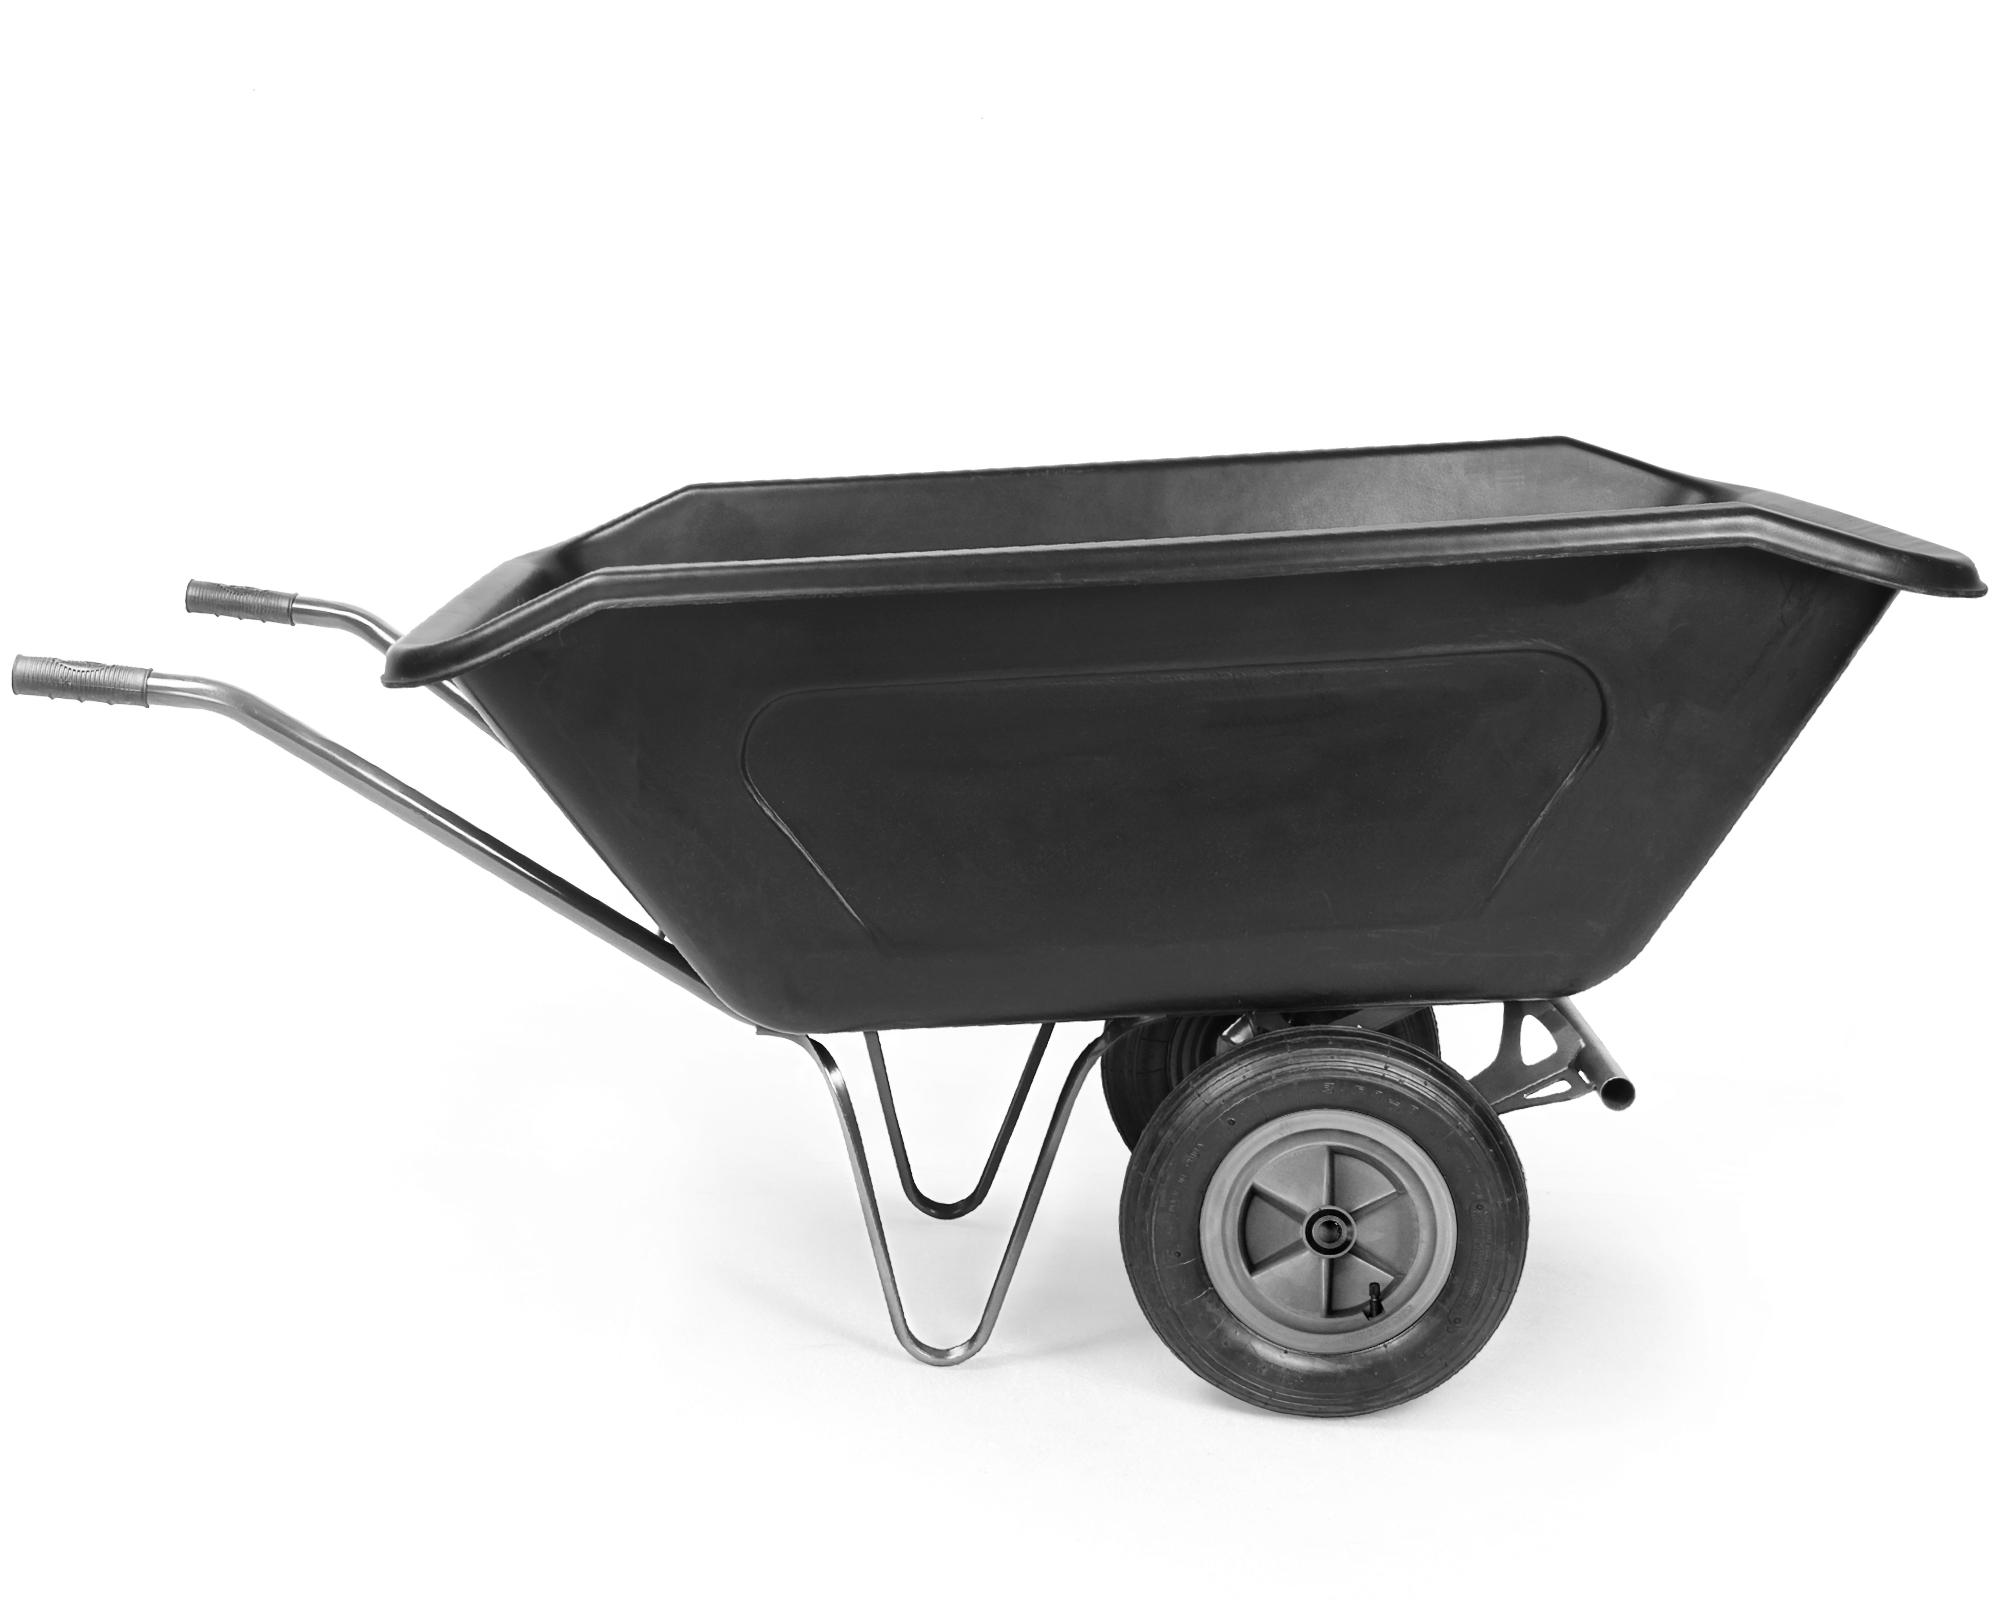 ondis24 bauschubkarre transportkarre zweirad schubkarre. Black Bedroom Furniture Sets. Home Design Ideas